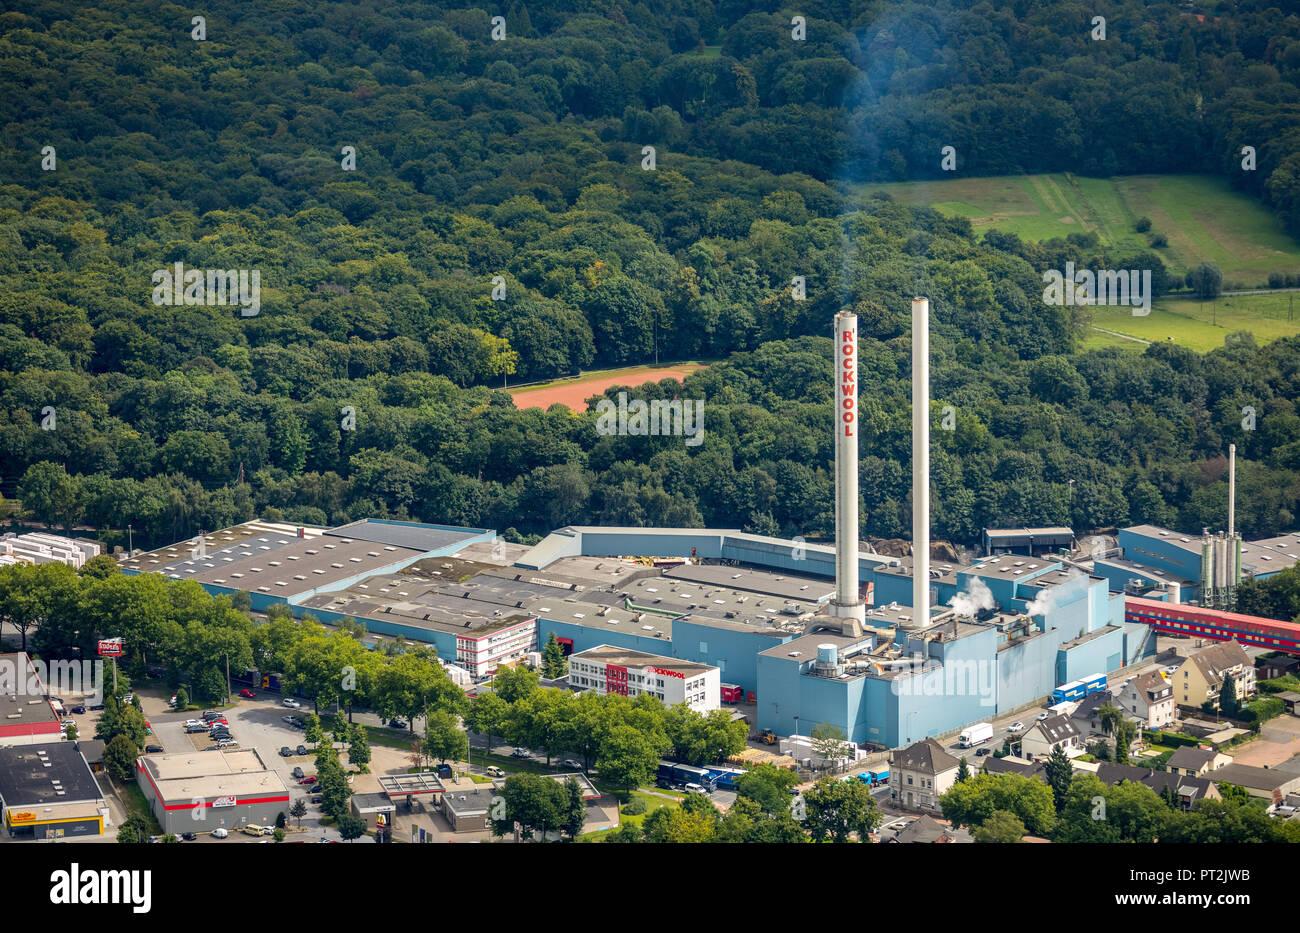 Rockwool BV / Rockpanel Group, smokestacks, emission, Gladbeck, Ruhr area, North Rhine-Westphalia, Germany - Stock Image